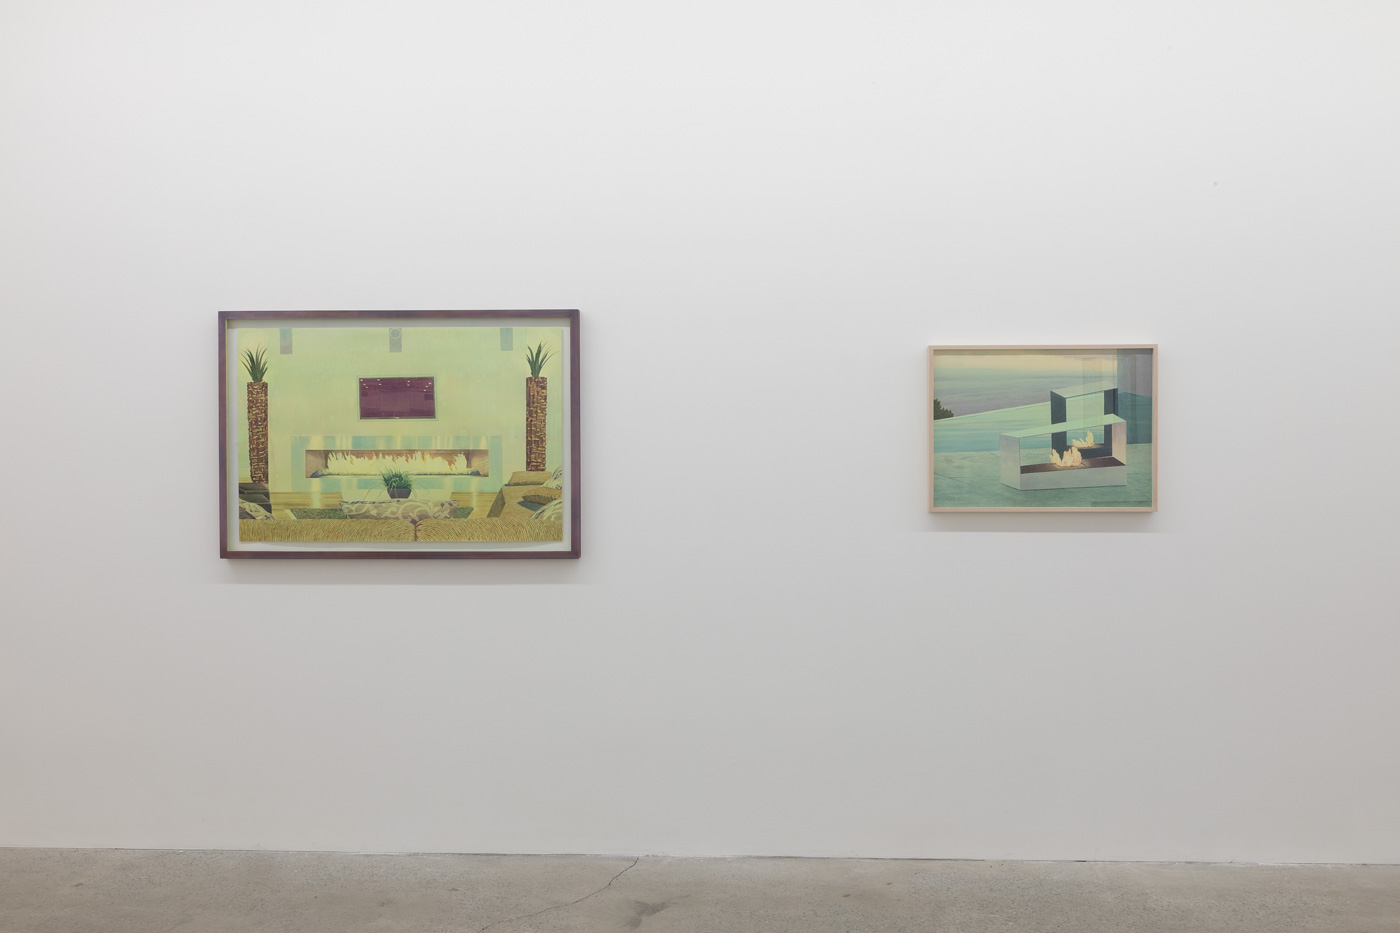 Tristram Lansdowne, Modal Home, 2017, exhibition view